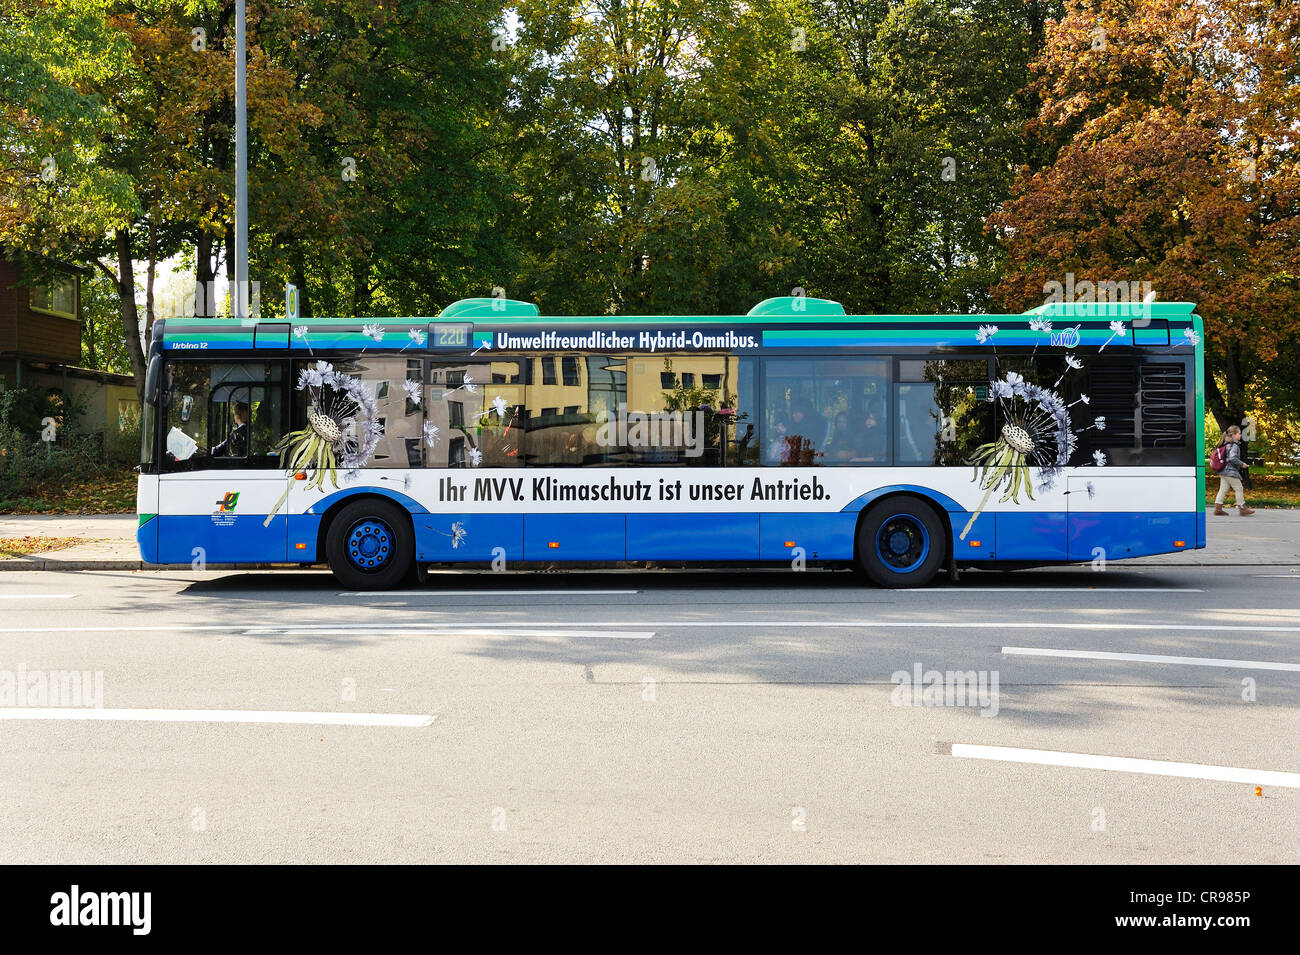 Environmentally-friendly hybrid bus, Munich, Bavaria, Germany, Europe - Stock Image